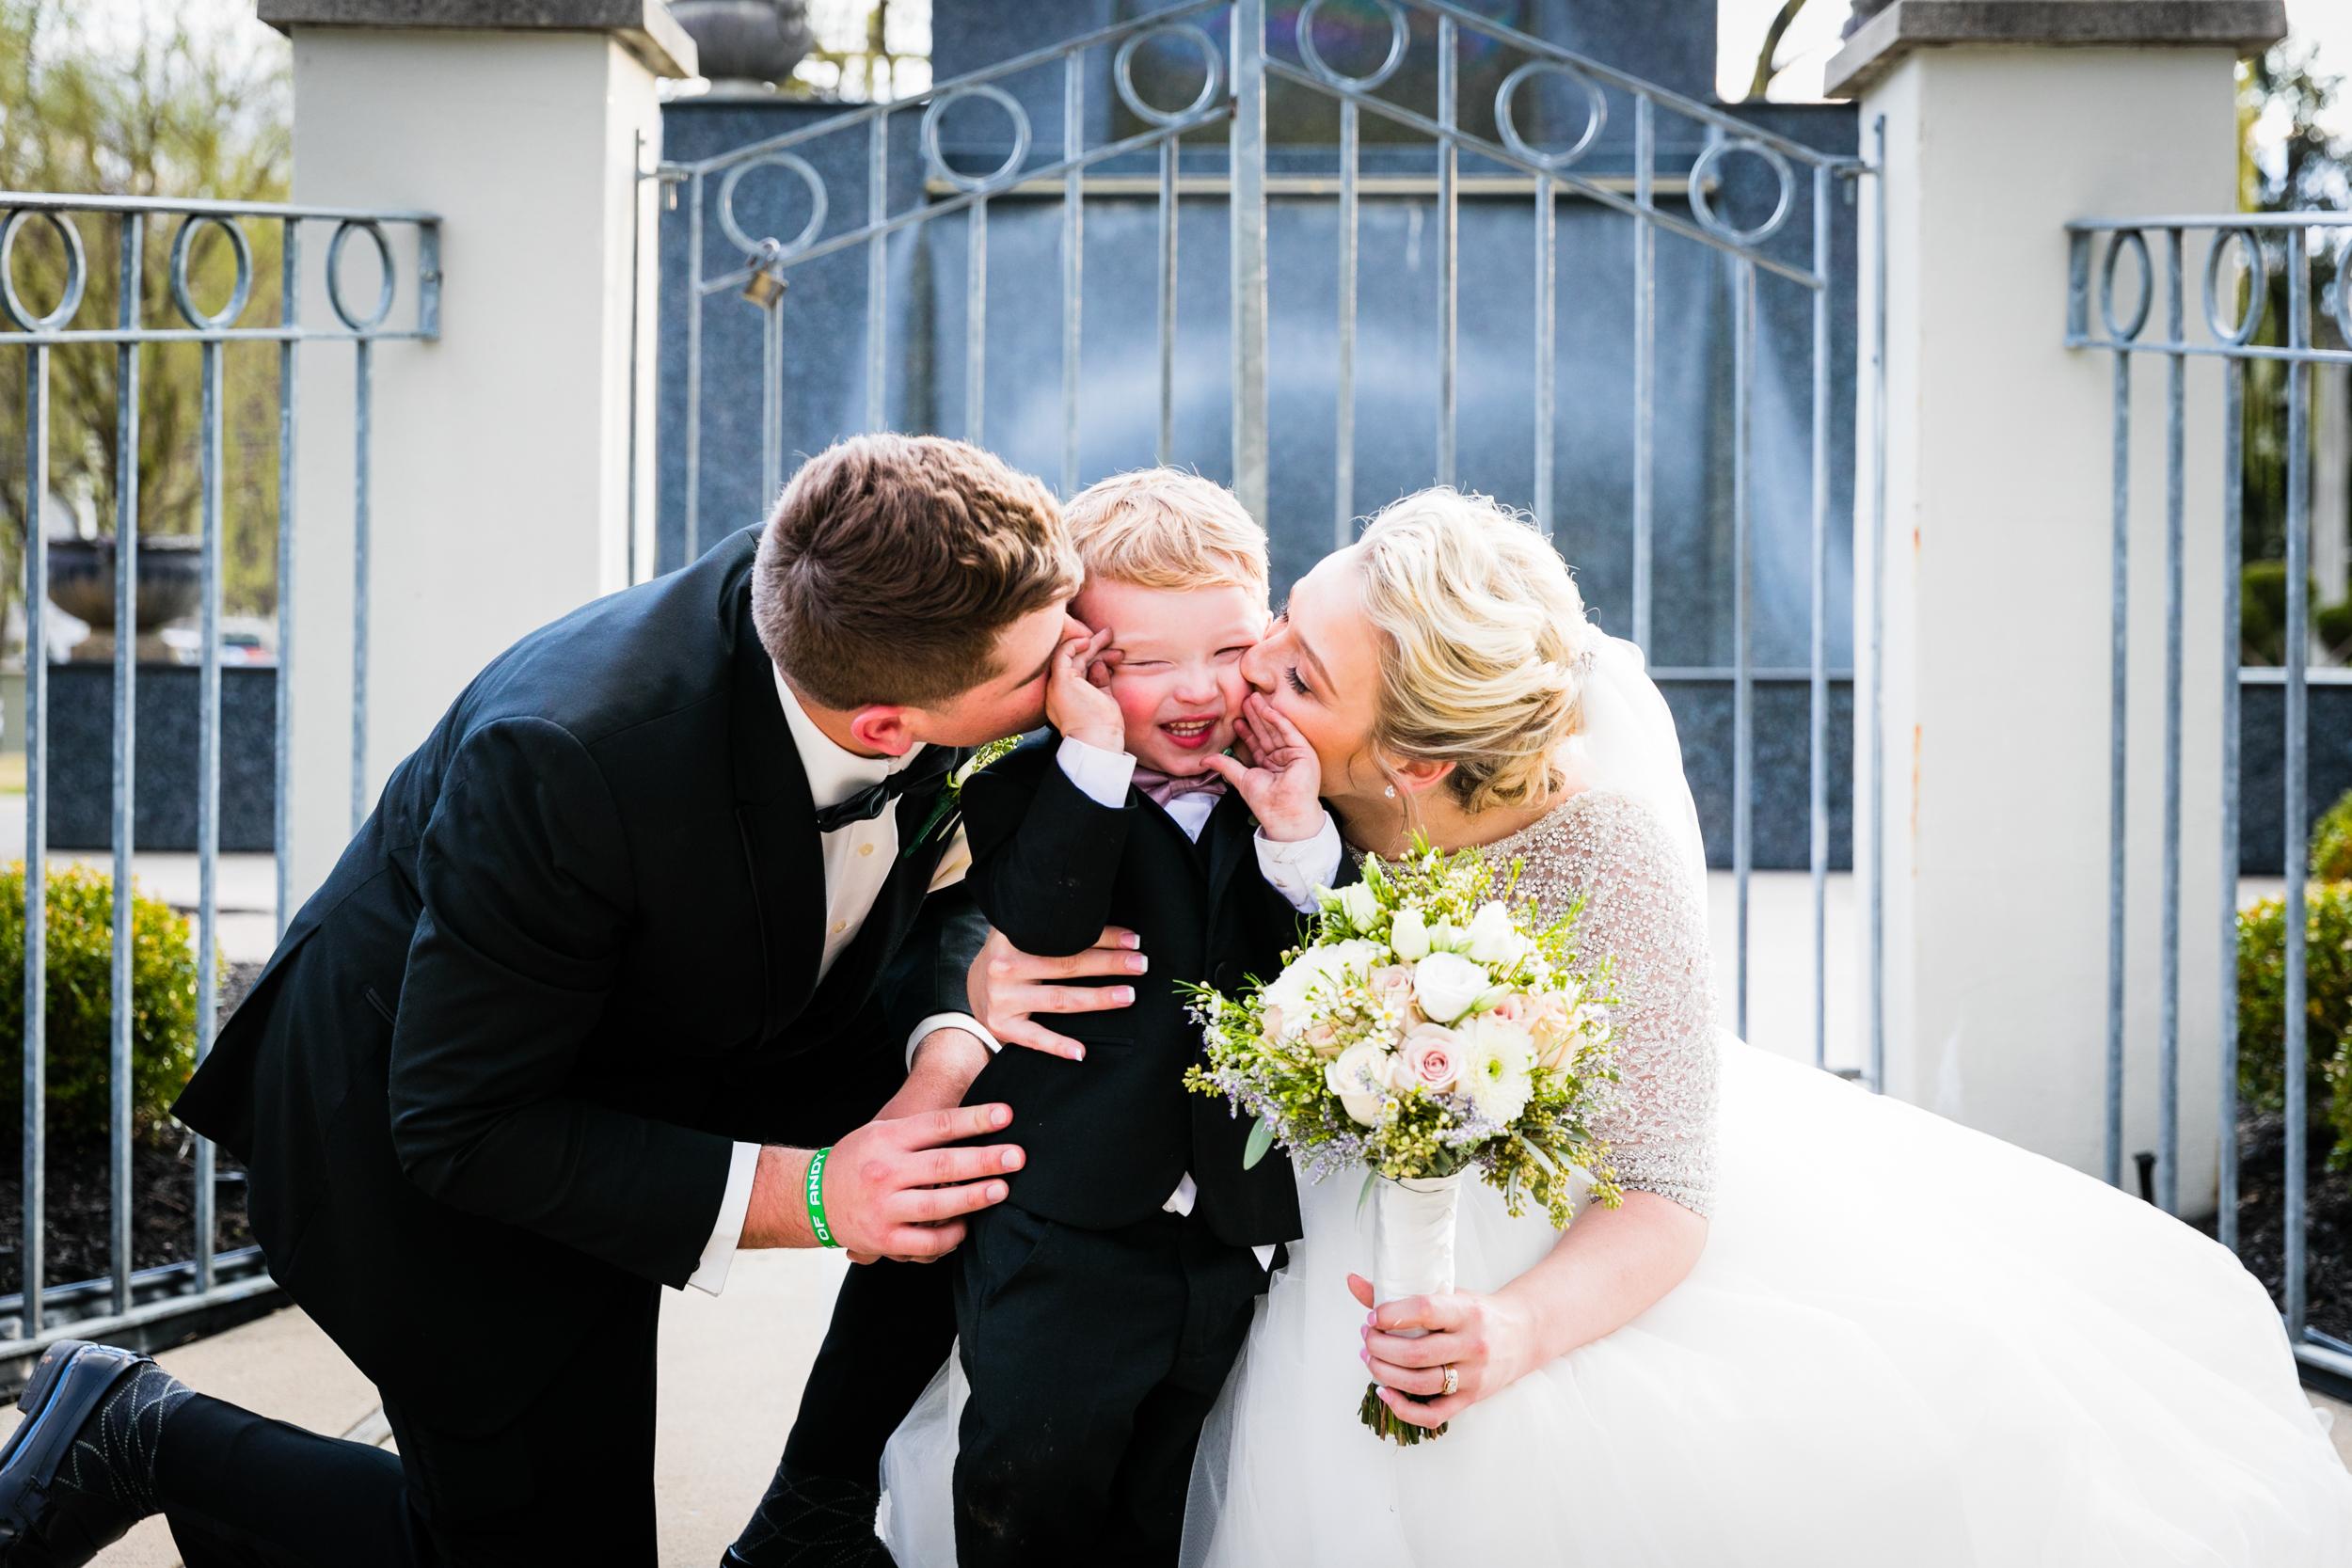 CELEBRATIONS BENSALEM WEDDING PHOTOGRAPHY-64.jpg